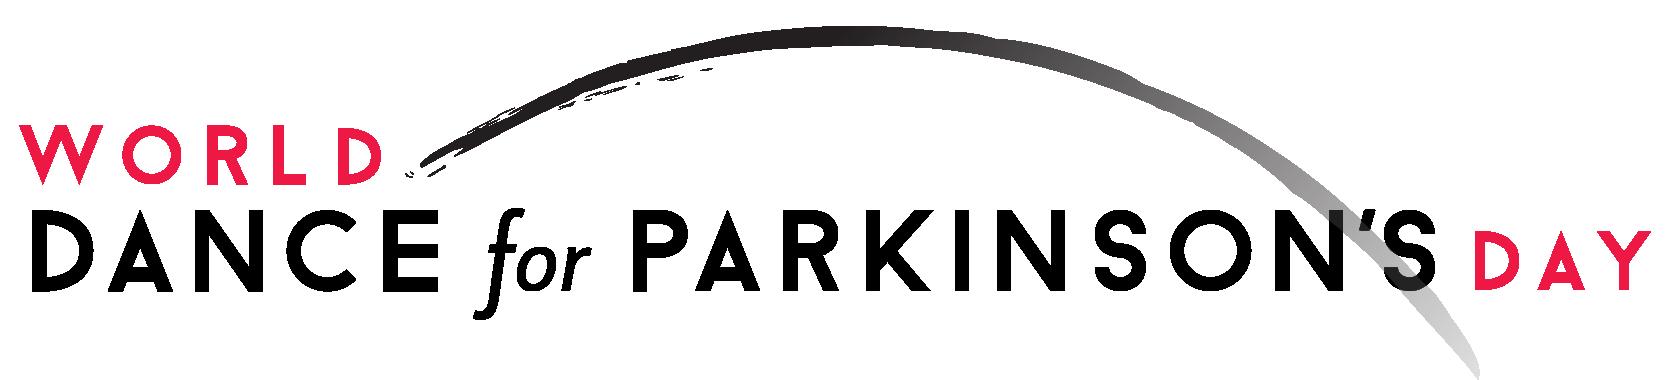 WorldDforParkinsonsDay-logo-horiz-lockup-general.png